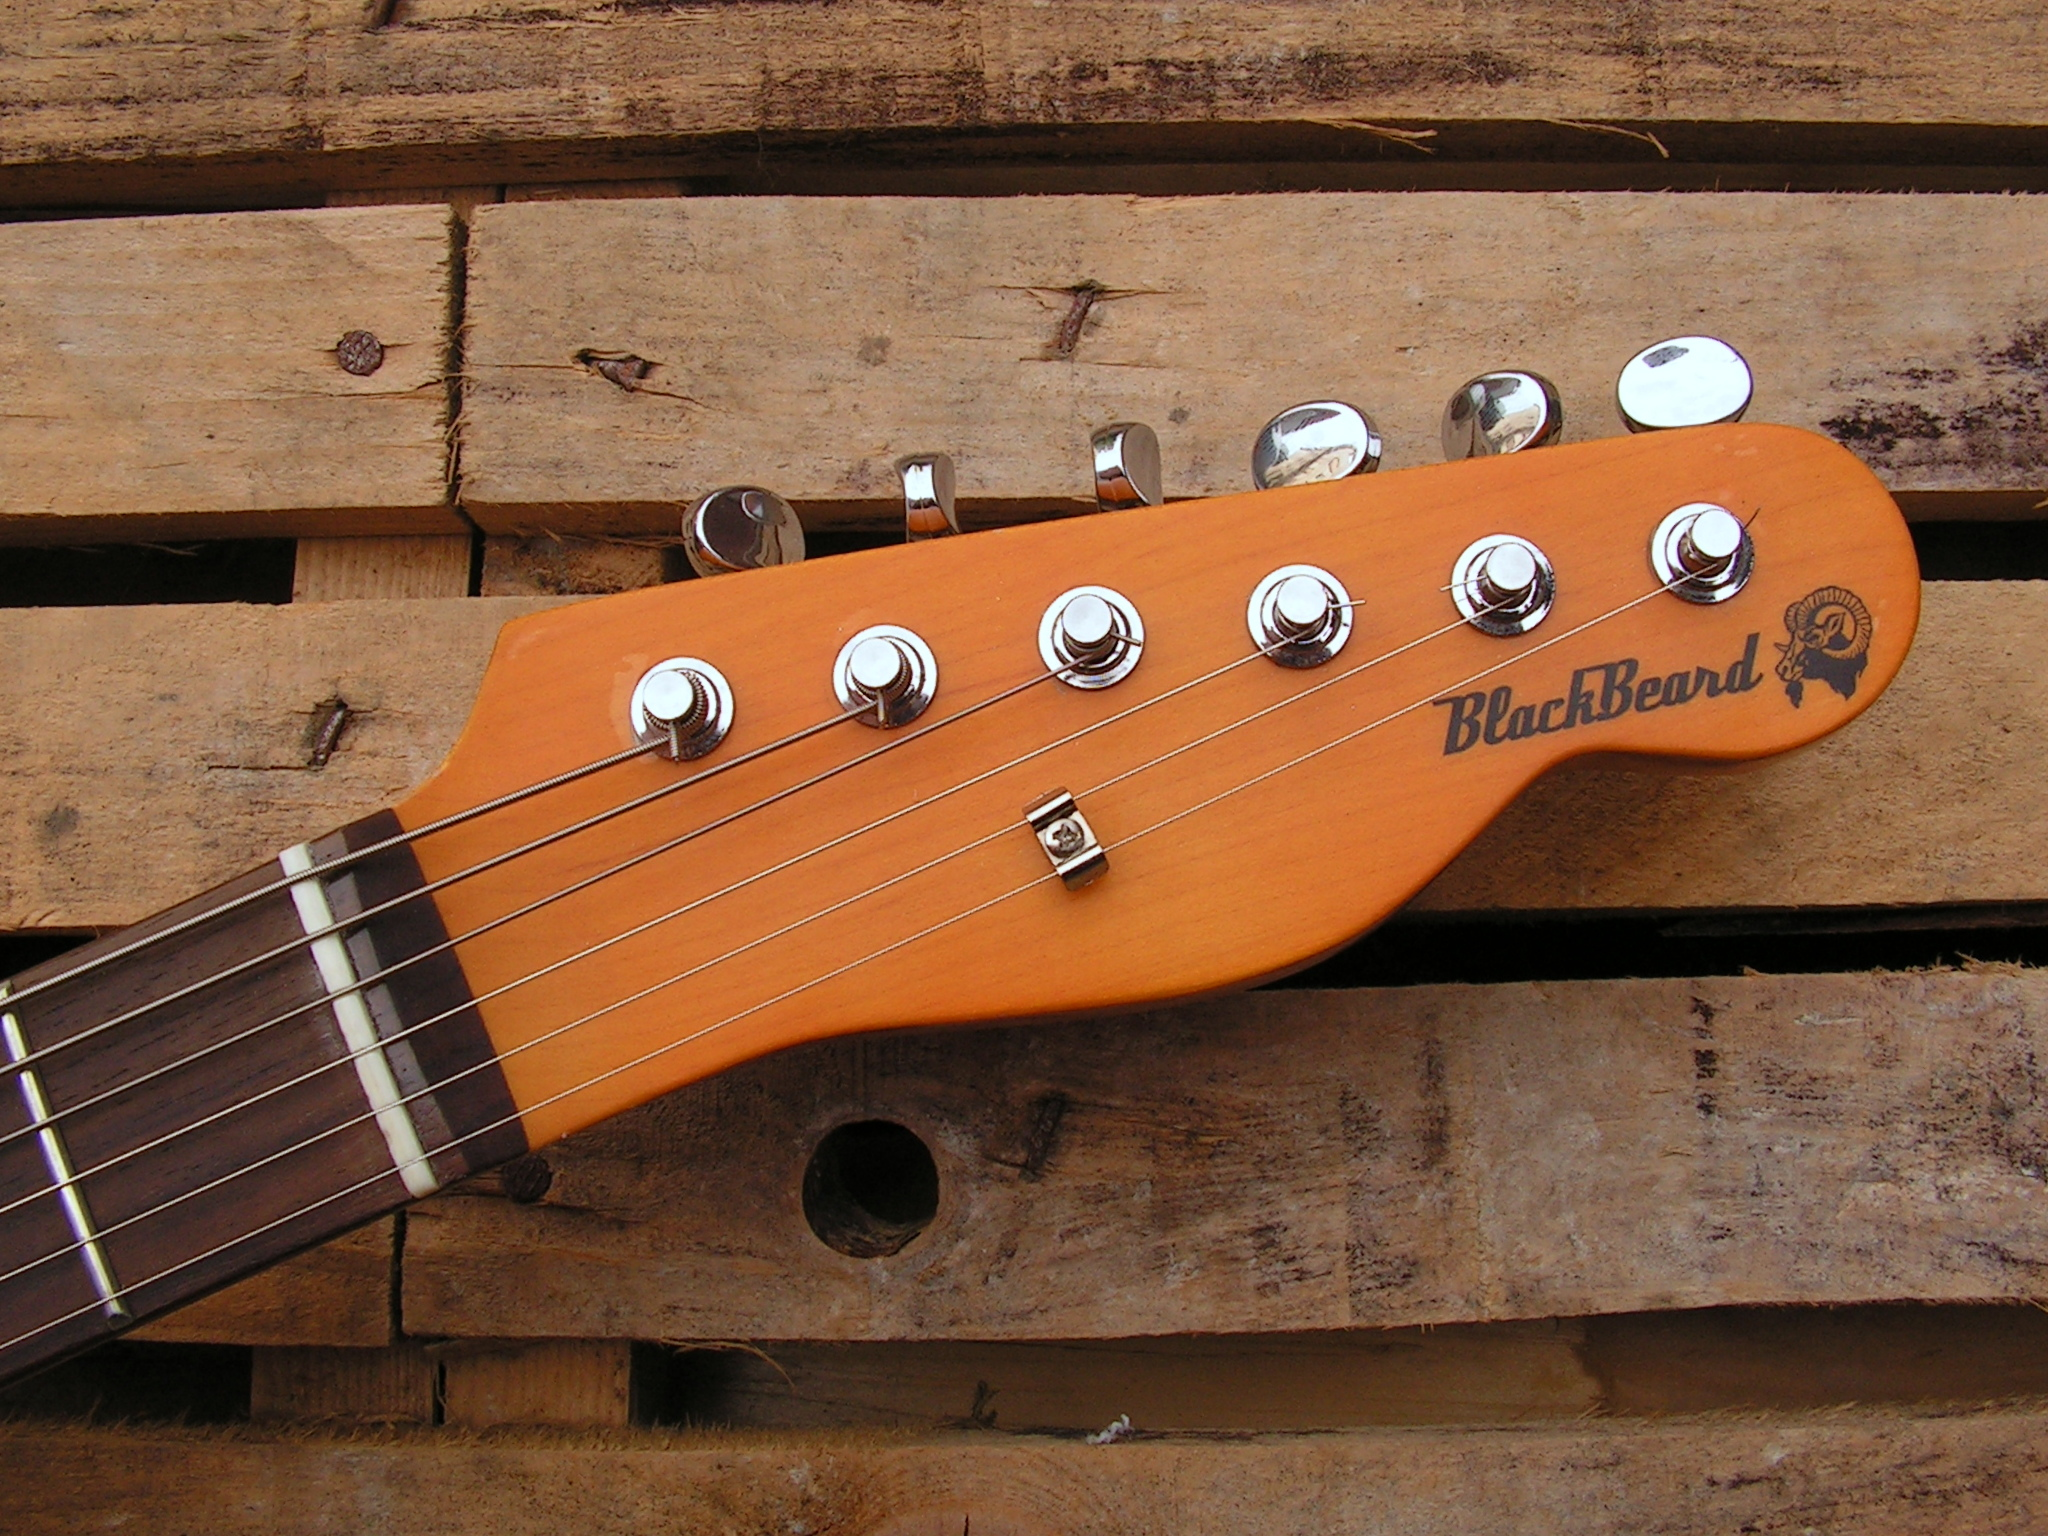 Paletta in acero di una chitarra in yellow pine roasted